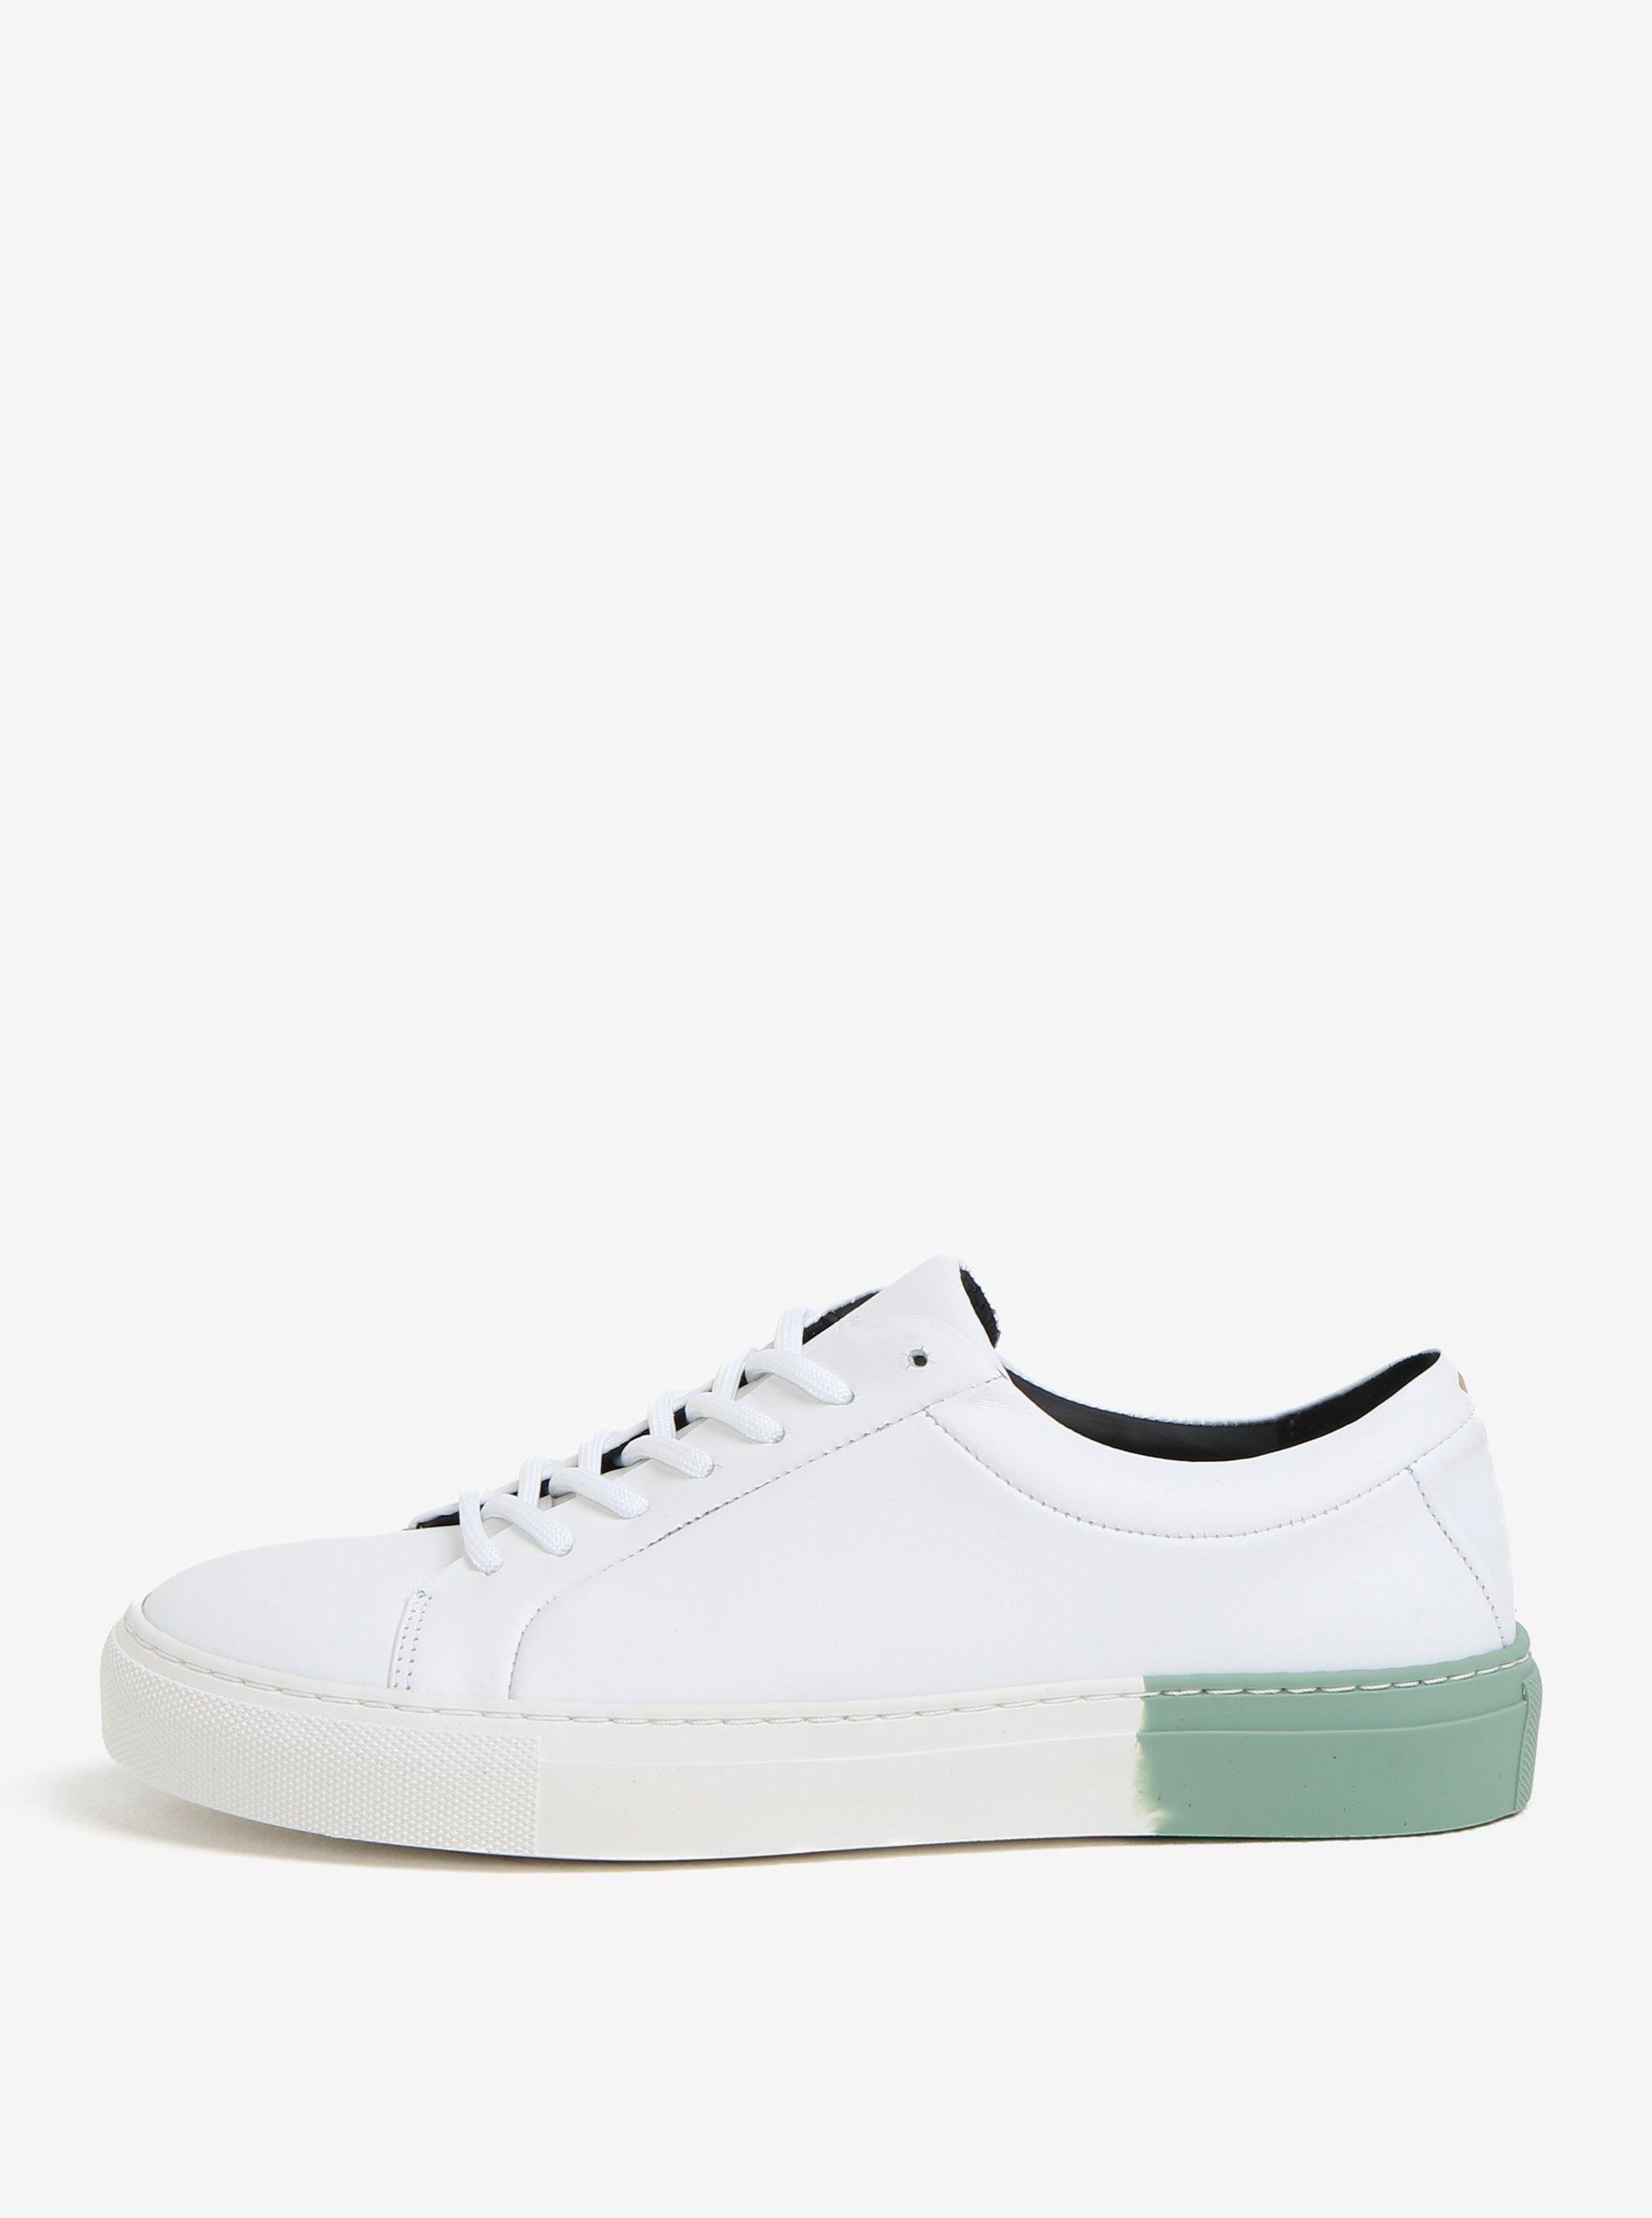 4cf3464867 Zeleno-biele dámske kožené tenisky Royal RepubliQ